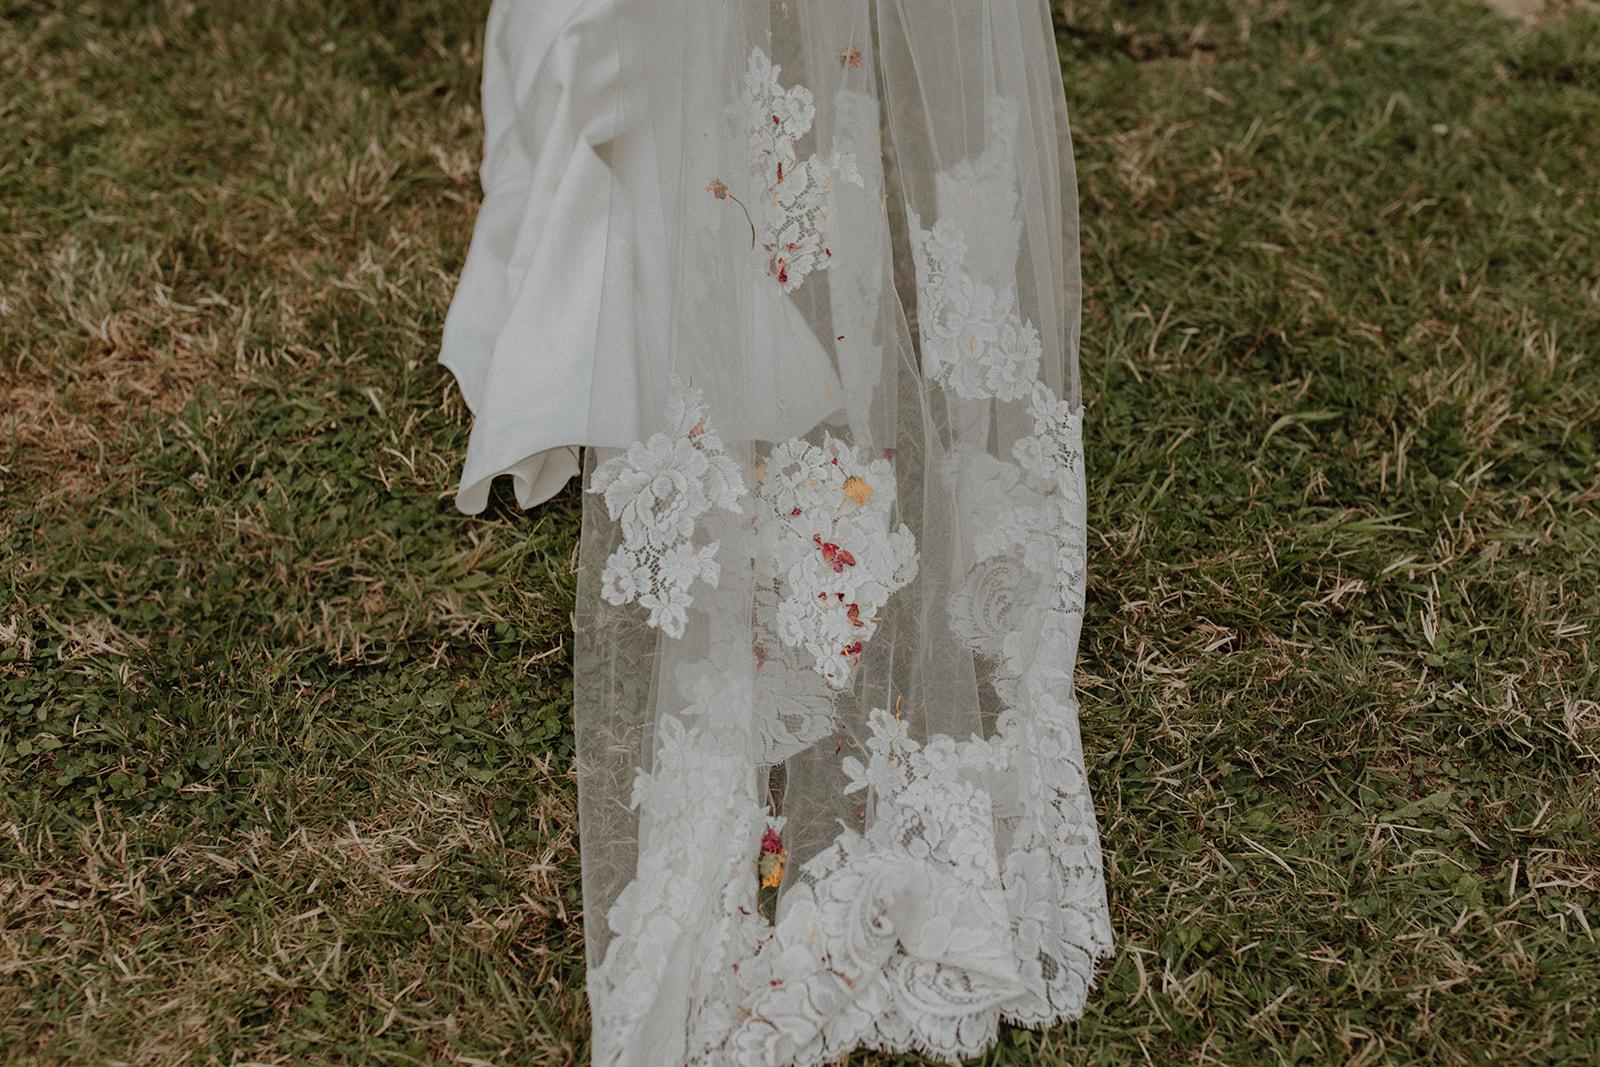 cortney_skye_wedding_june2019-450.jpg